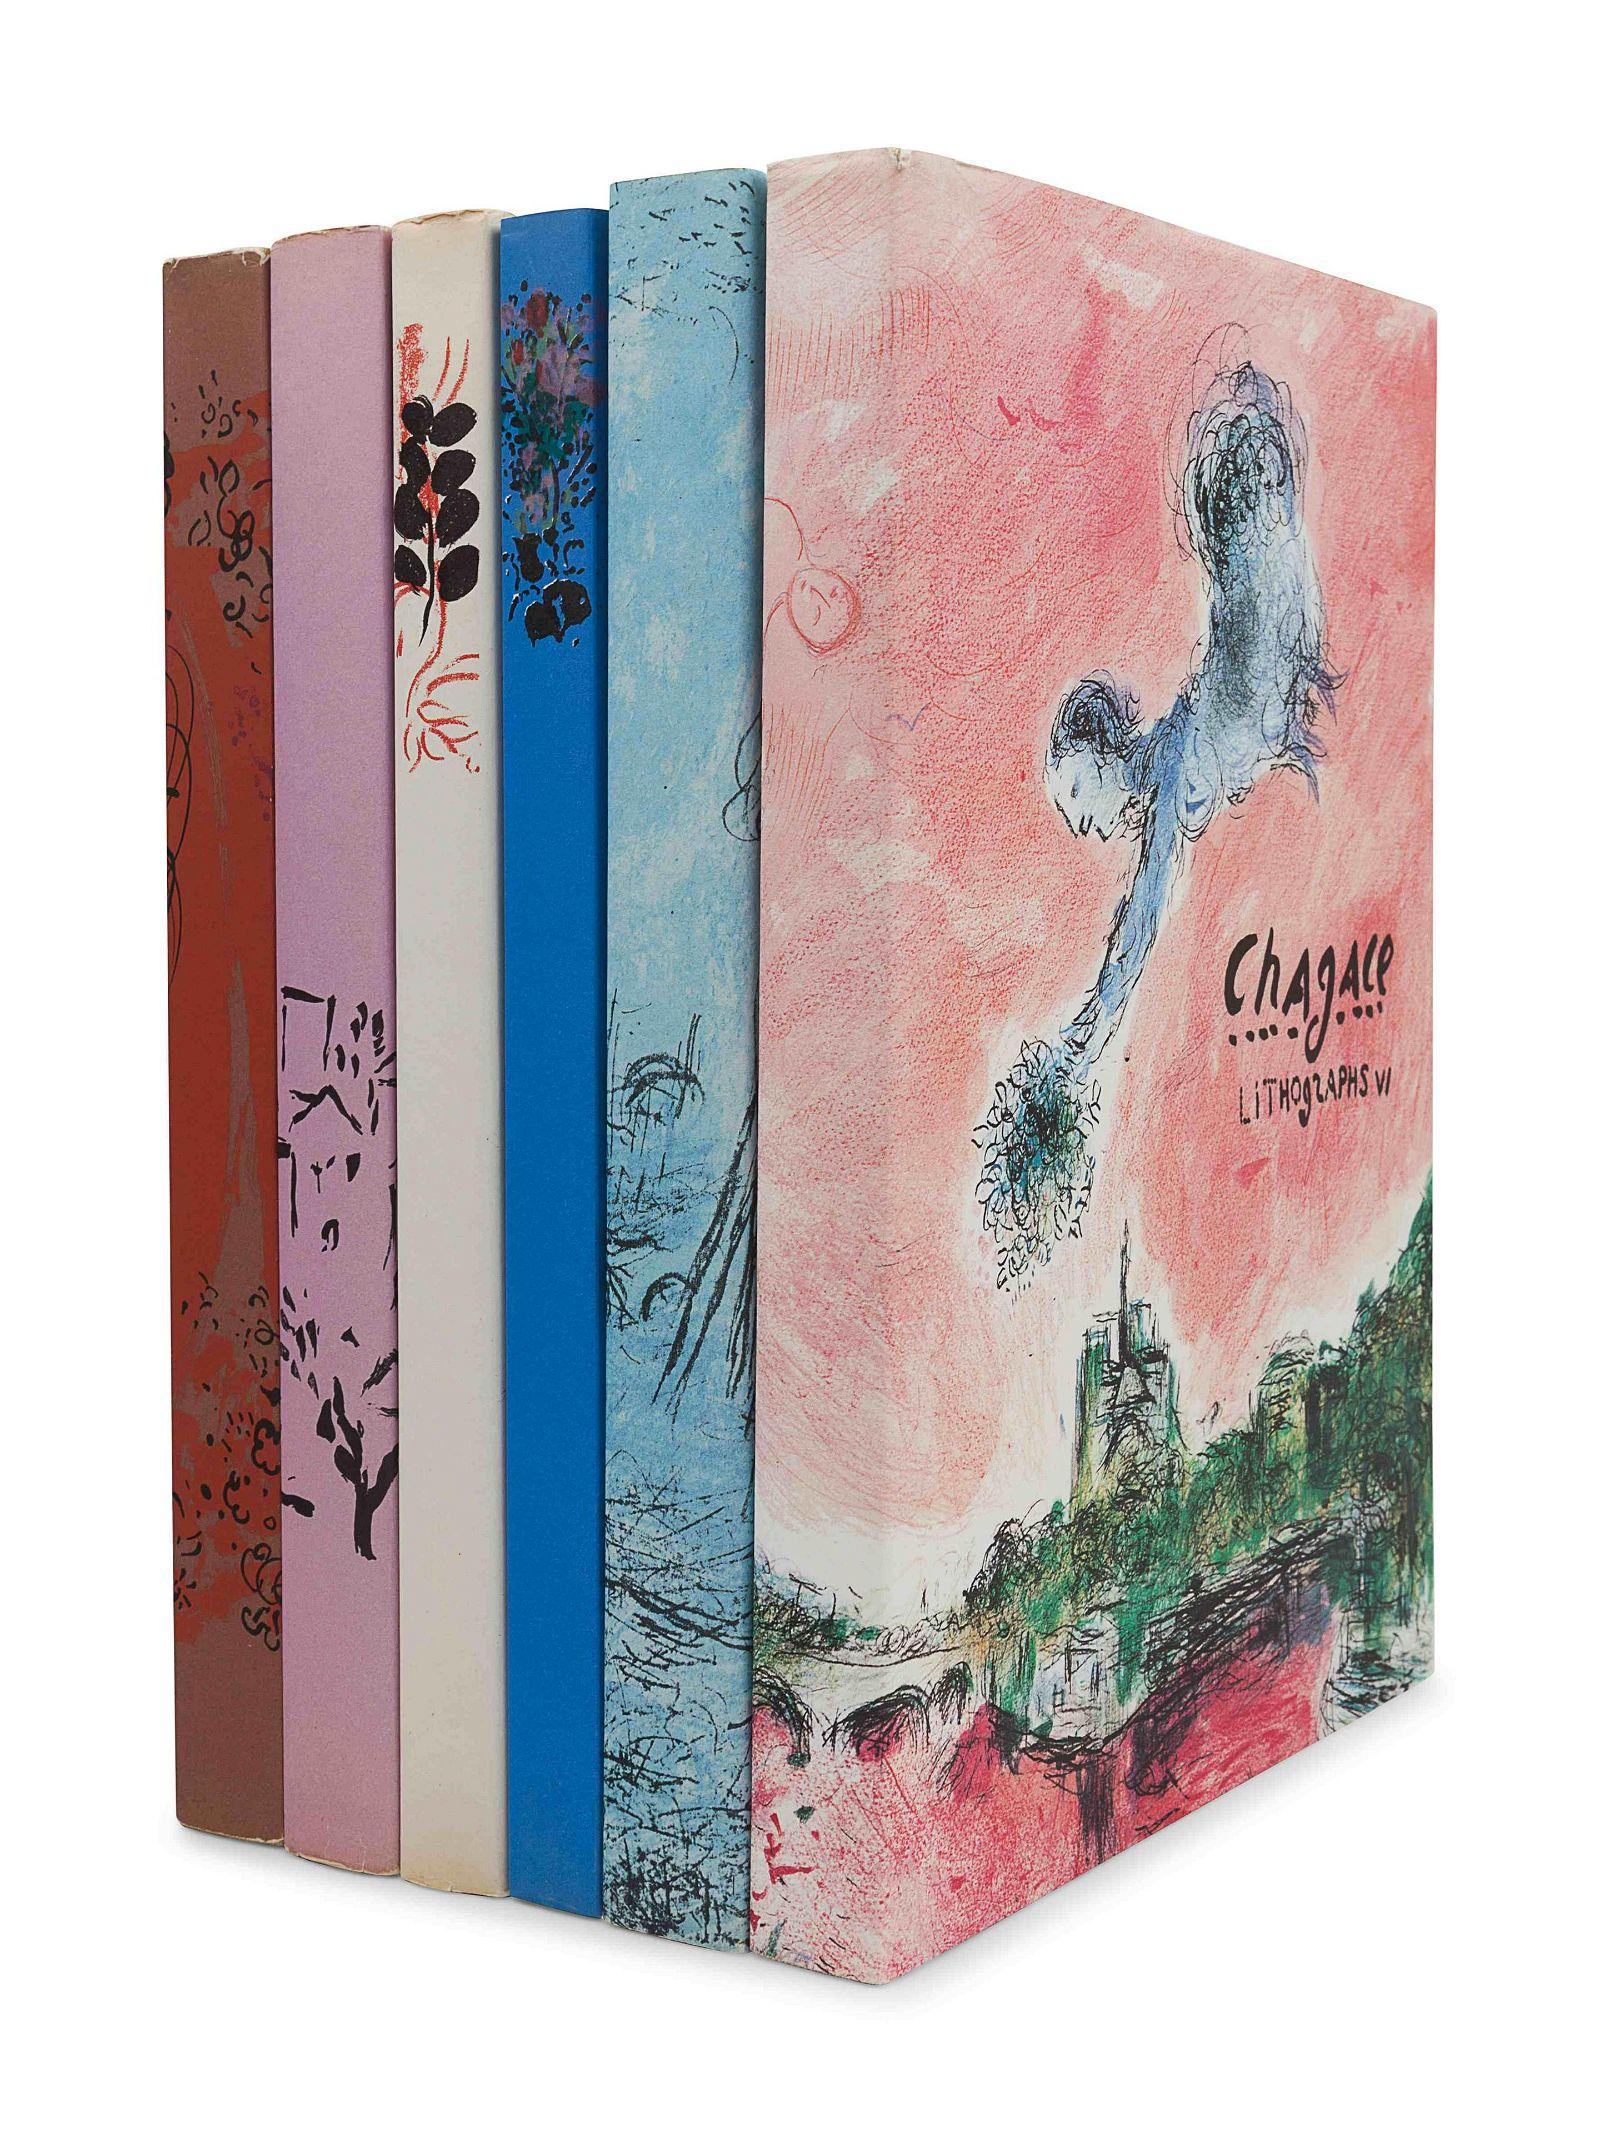 CHAGALL, Marc (1887-1985). Chagall Lithographs. Vol.I: